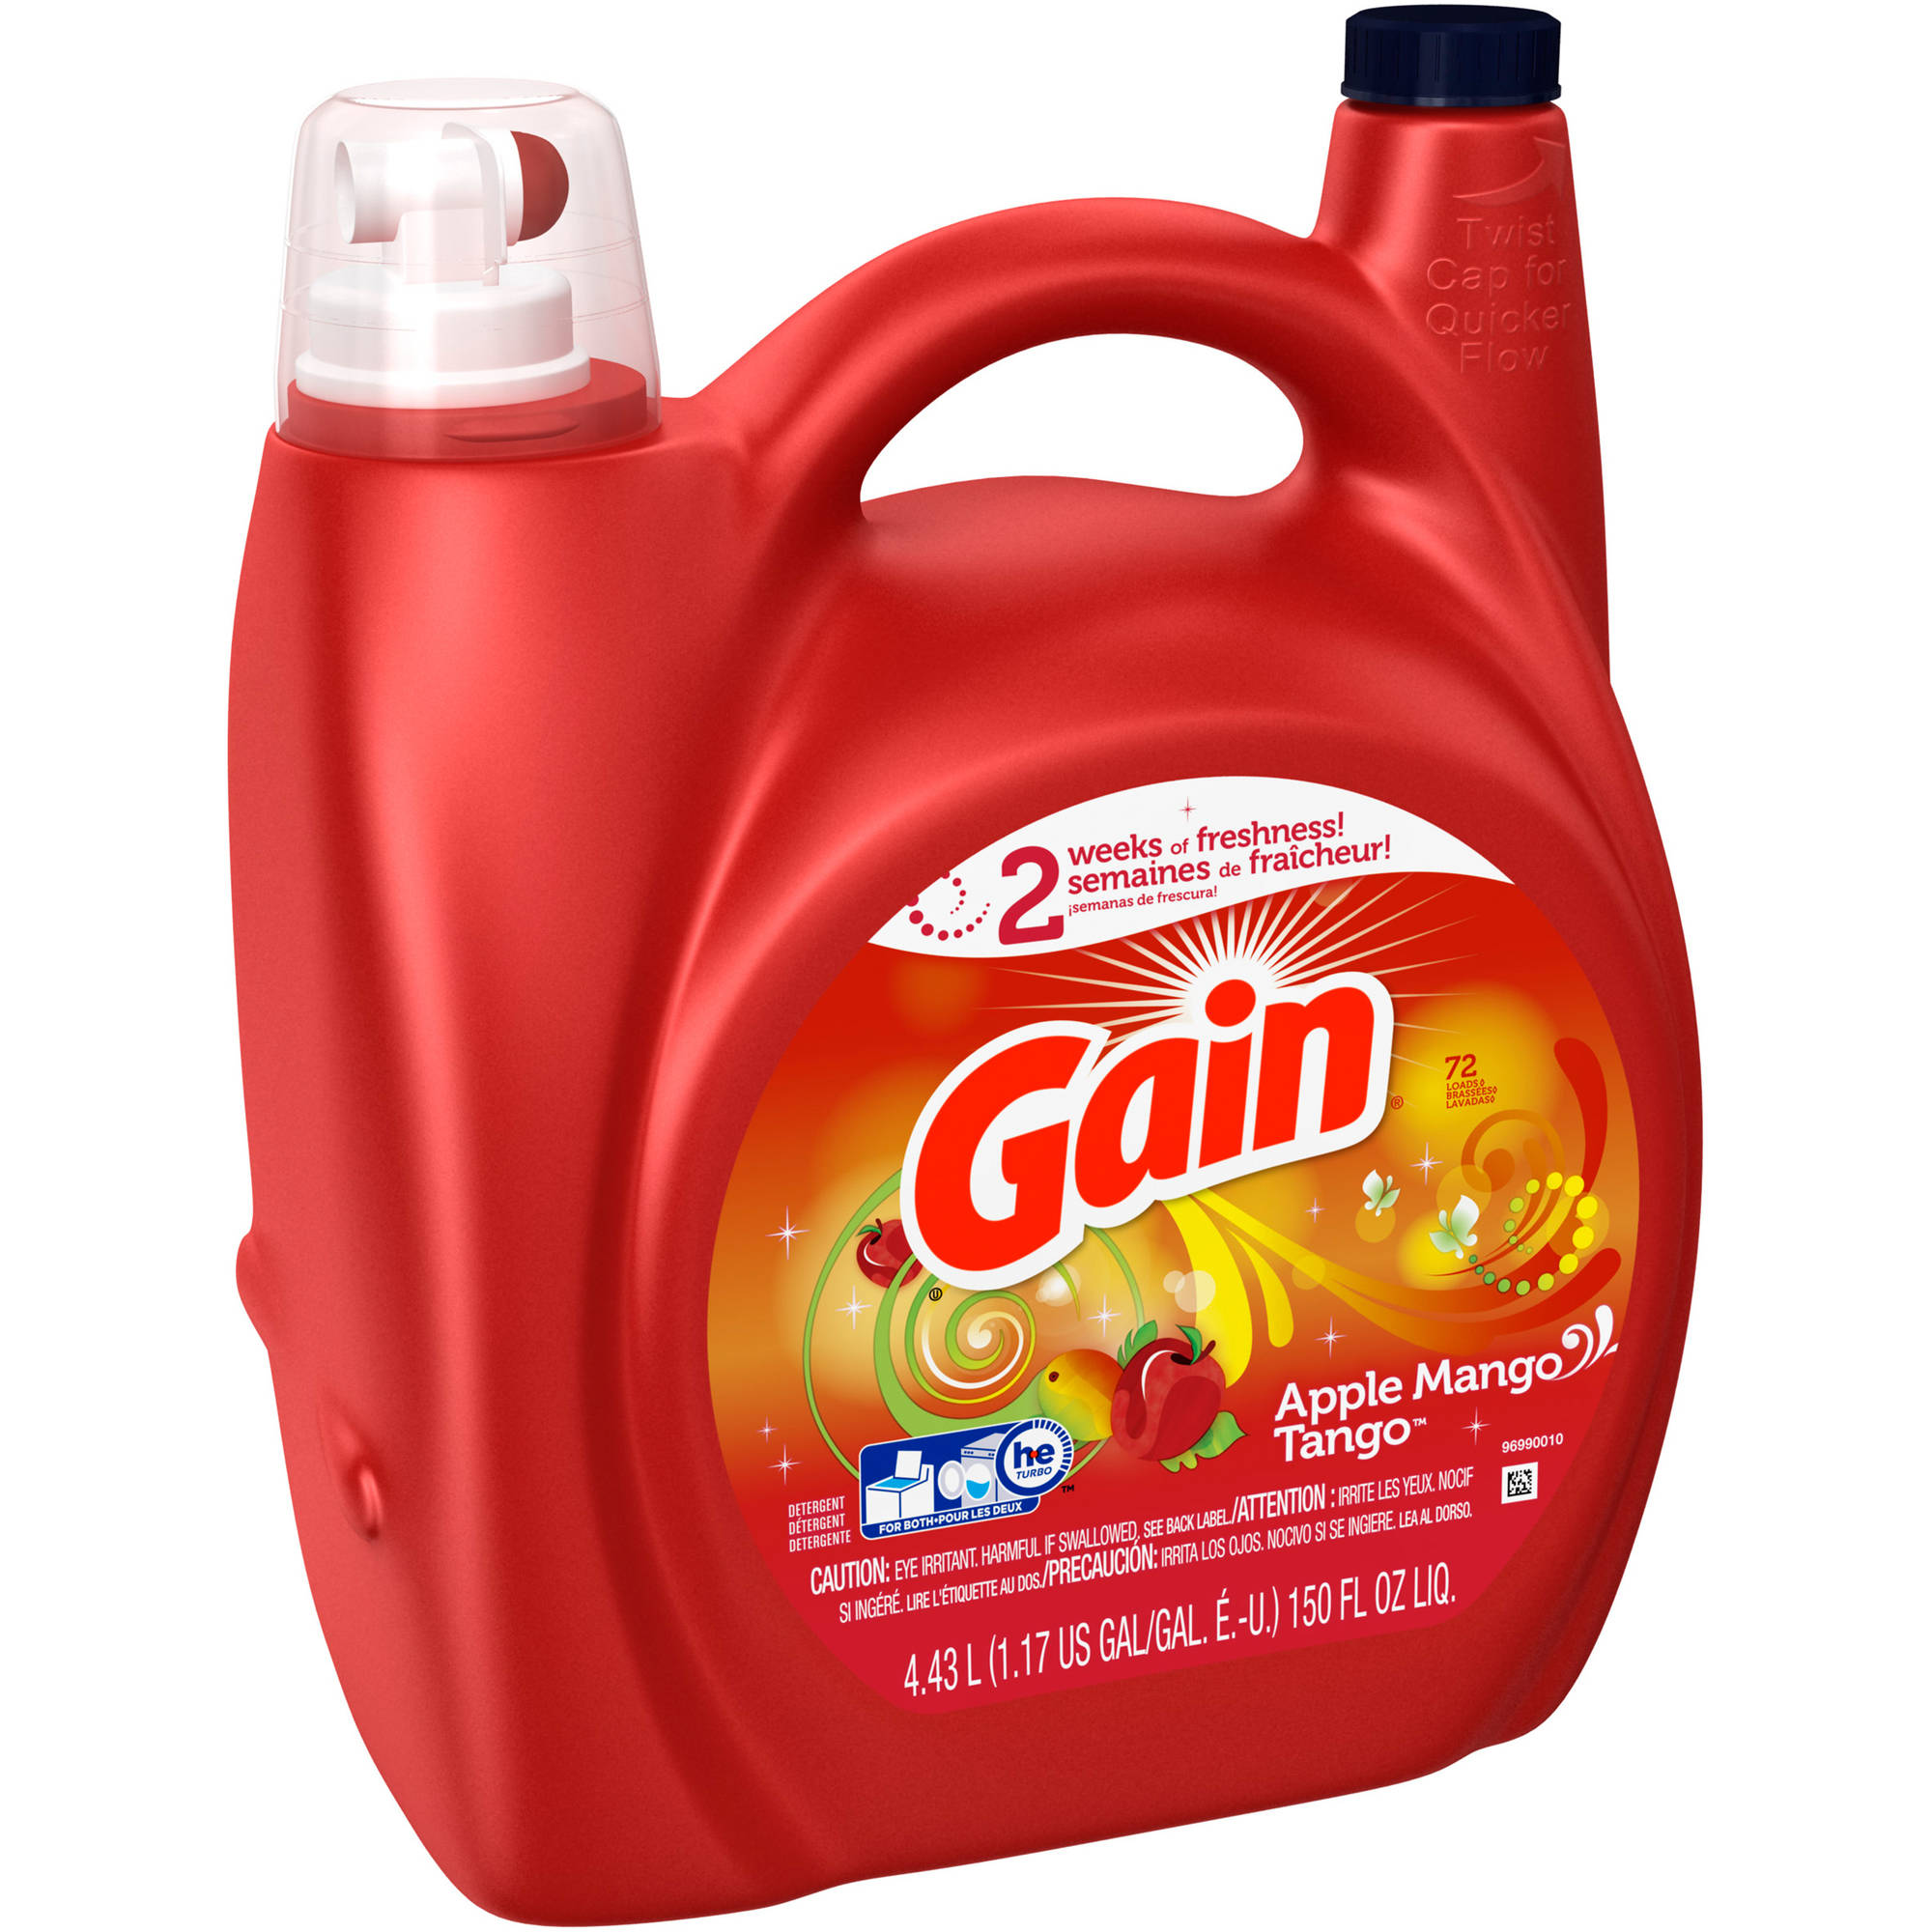 Gain Liquid Laundry Detergent, Apple Mango Tango, 72 Loads, 150 fl oz